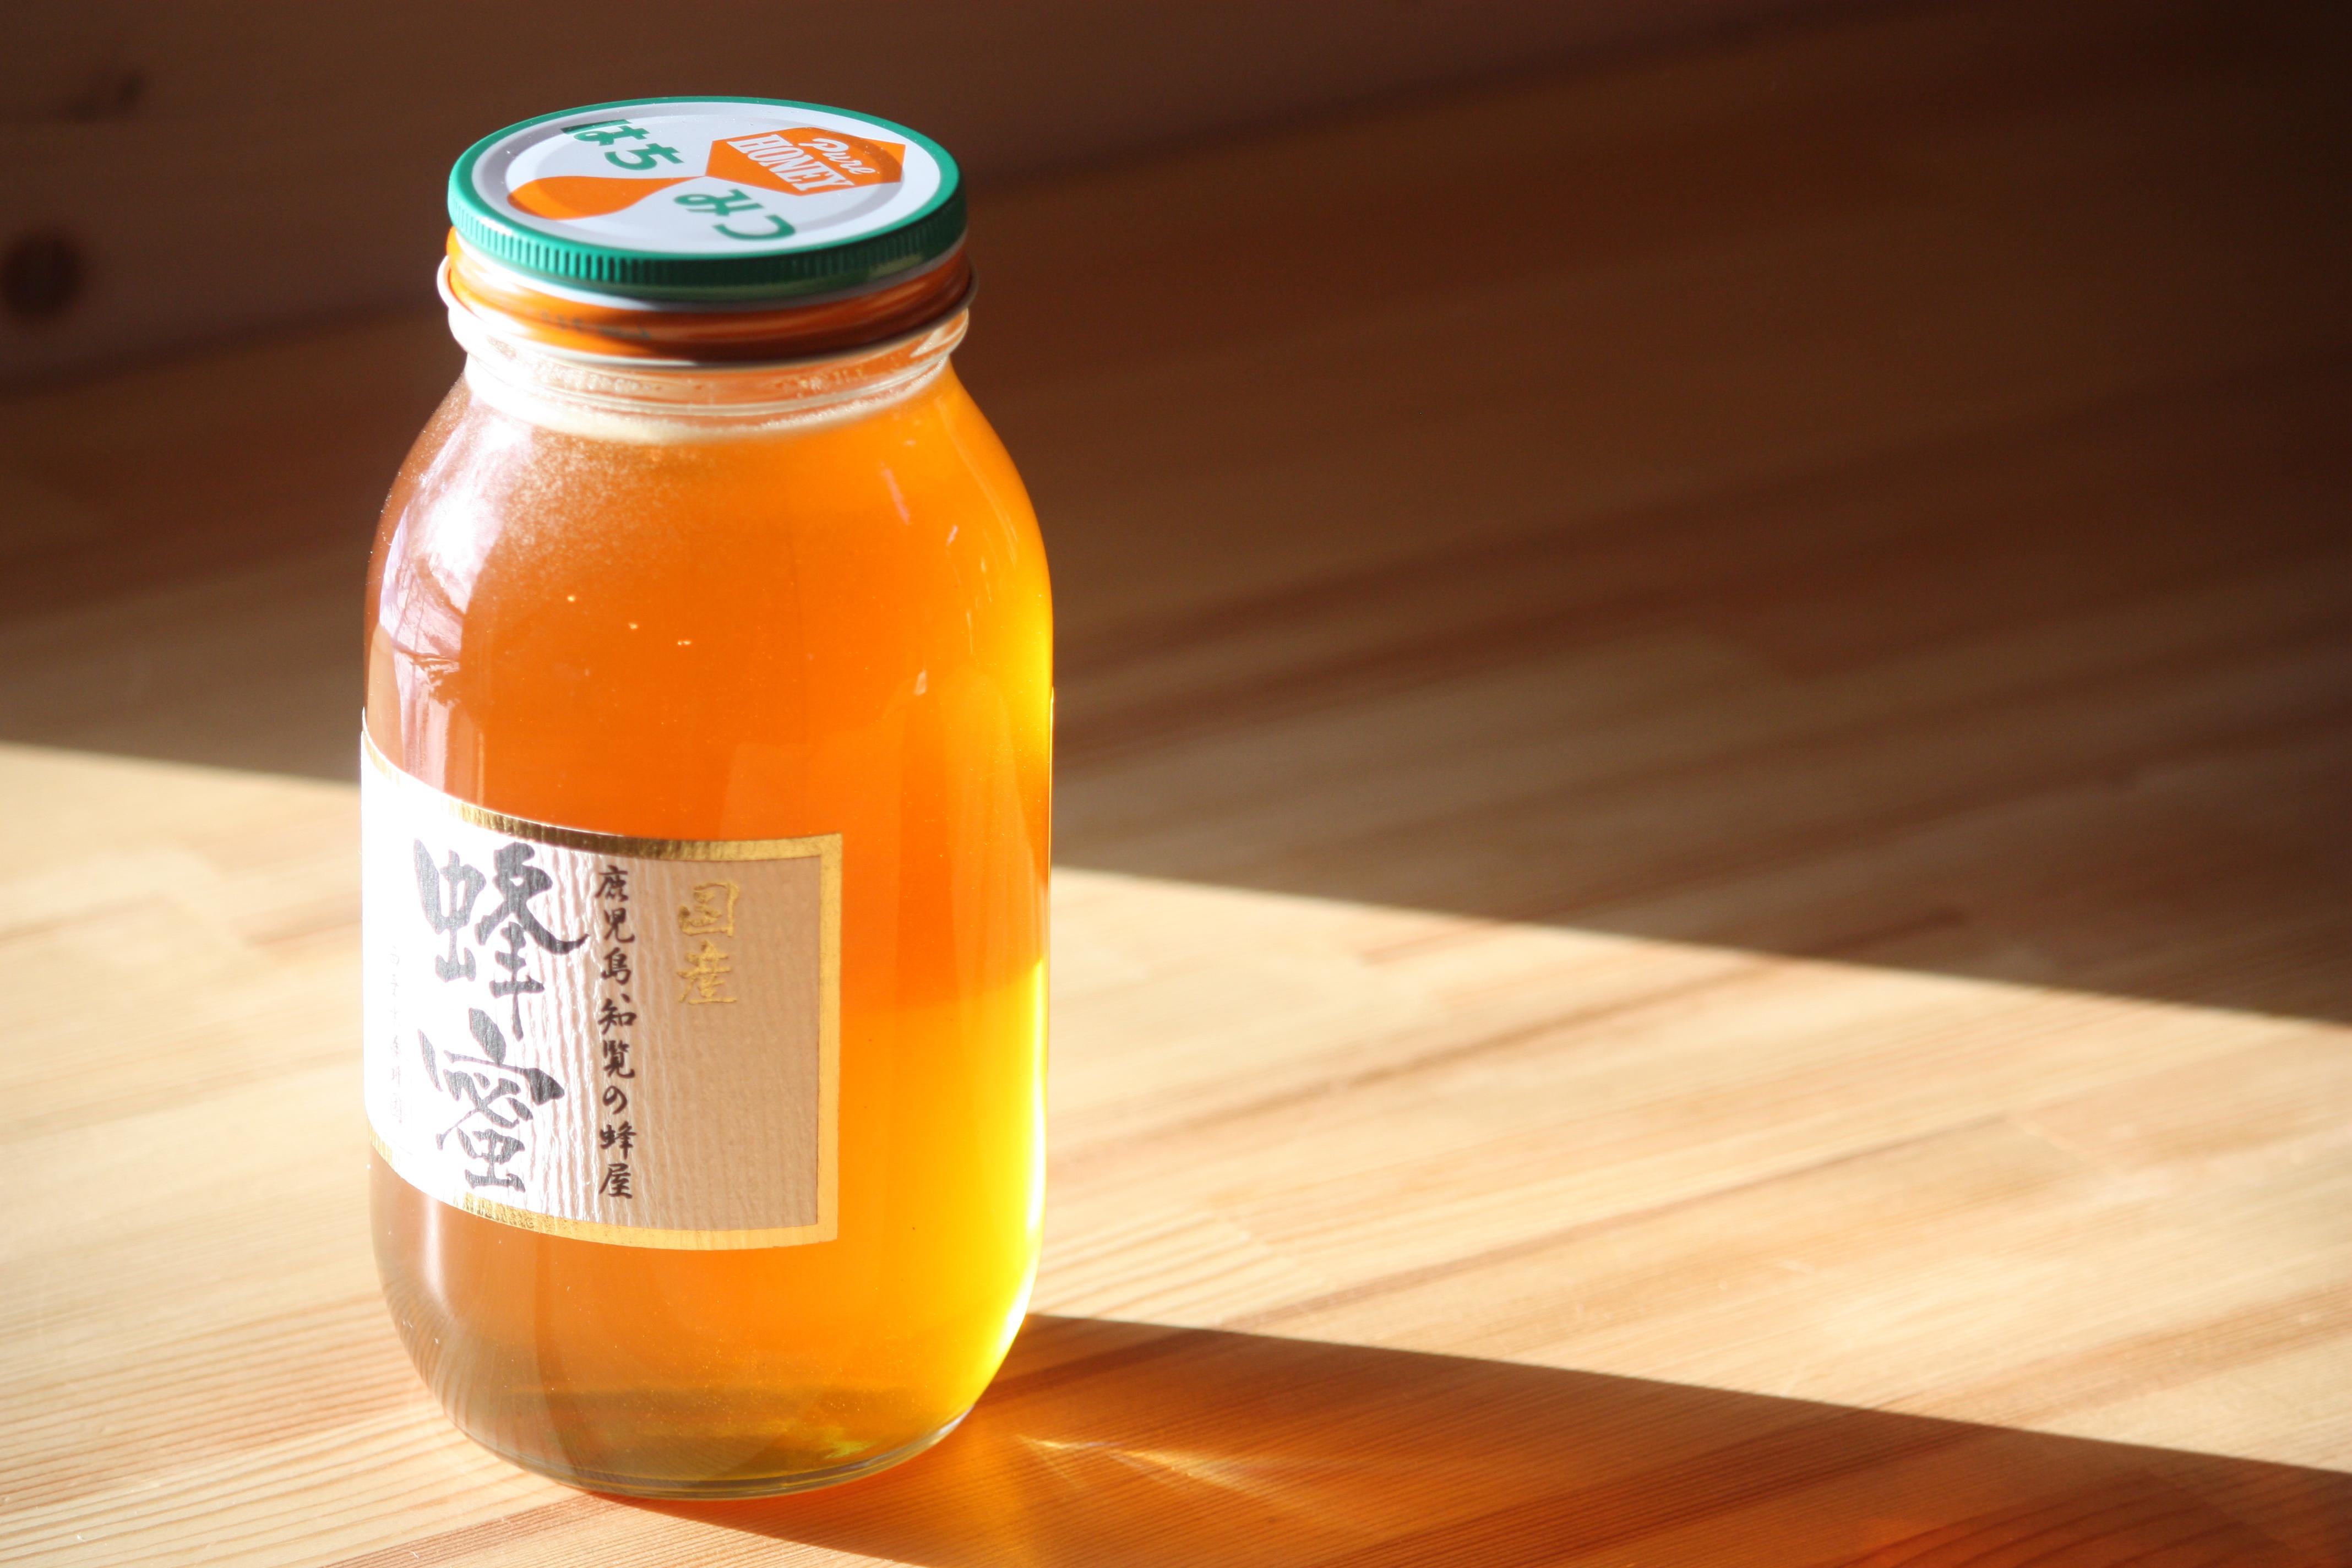 国産タンポポ蜂蜜 1200ℊ 北海道産